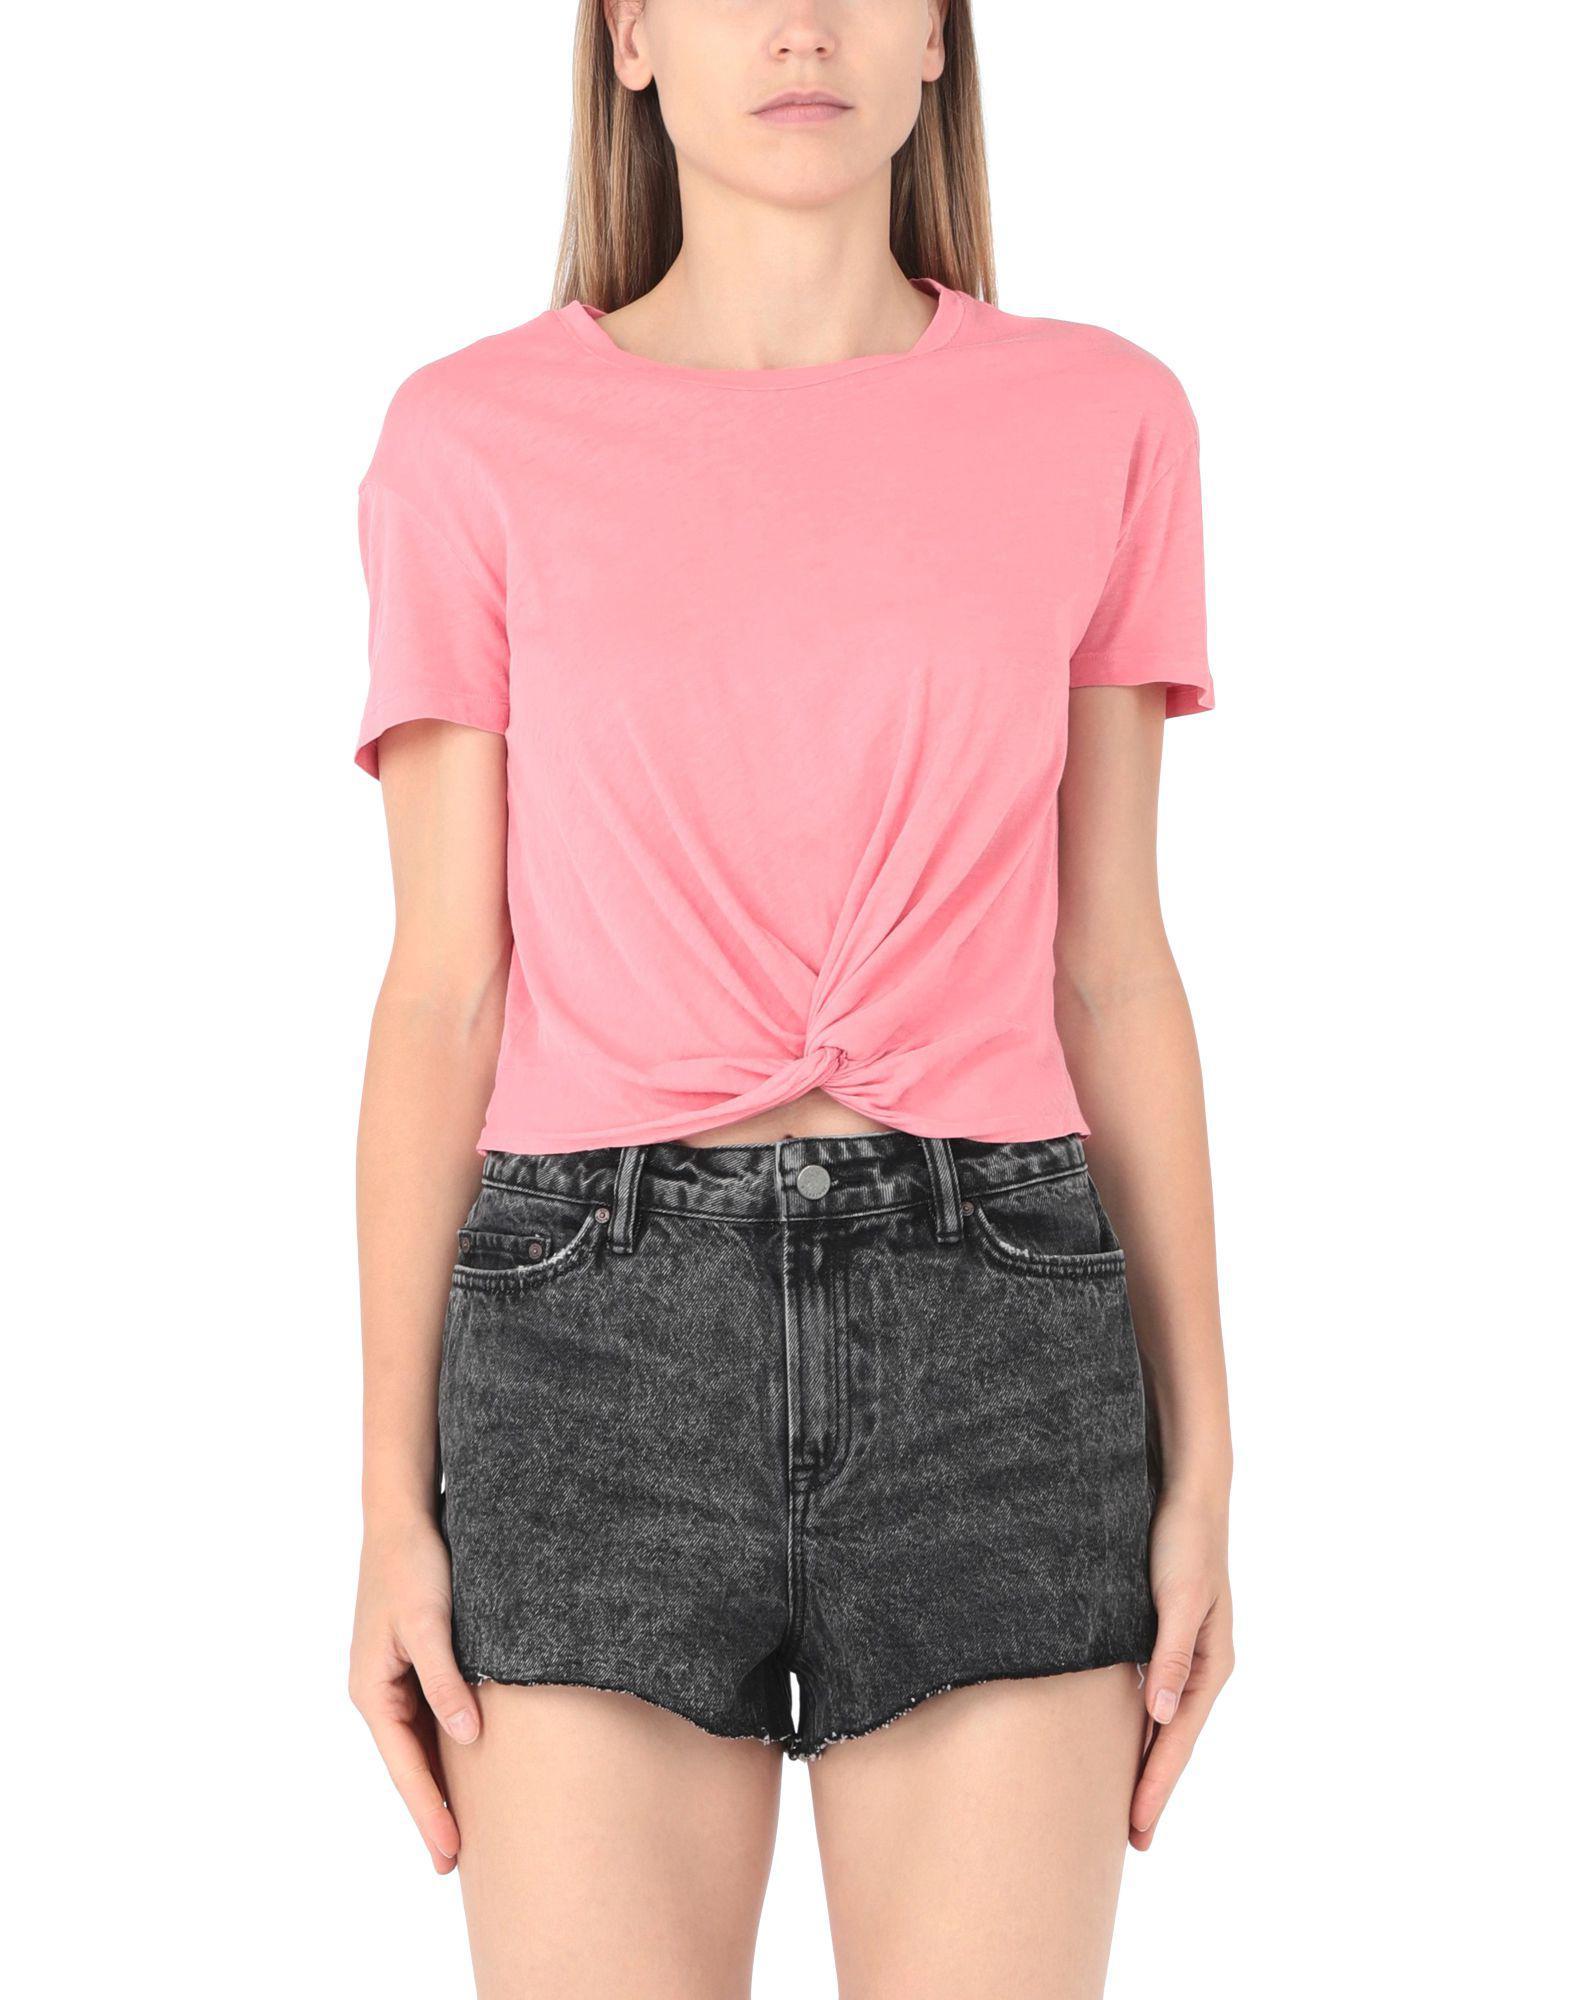 Camiseta AllSaints de Algodón de color Rosa